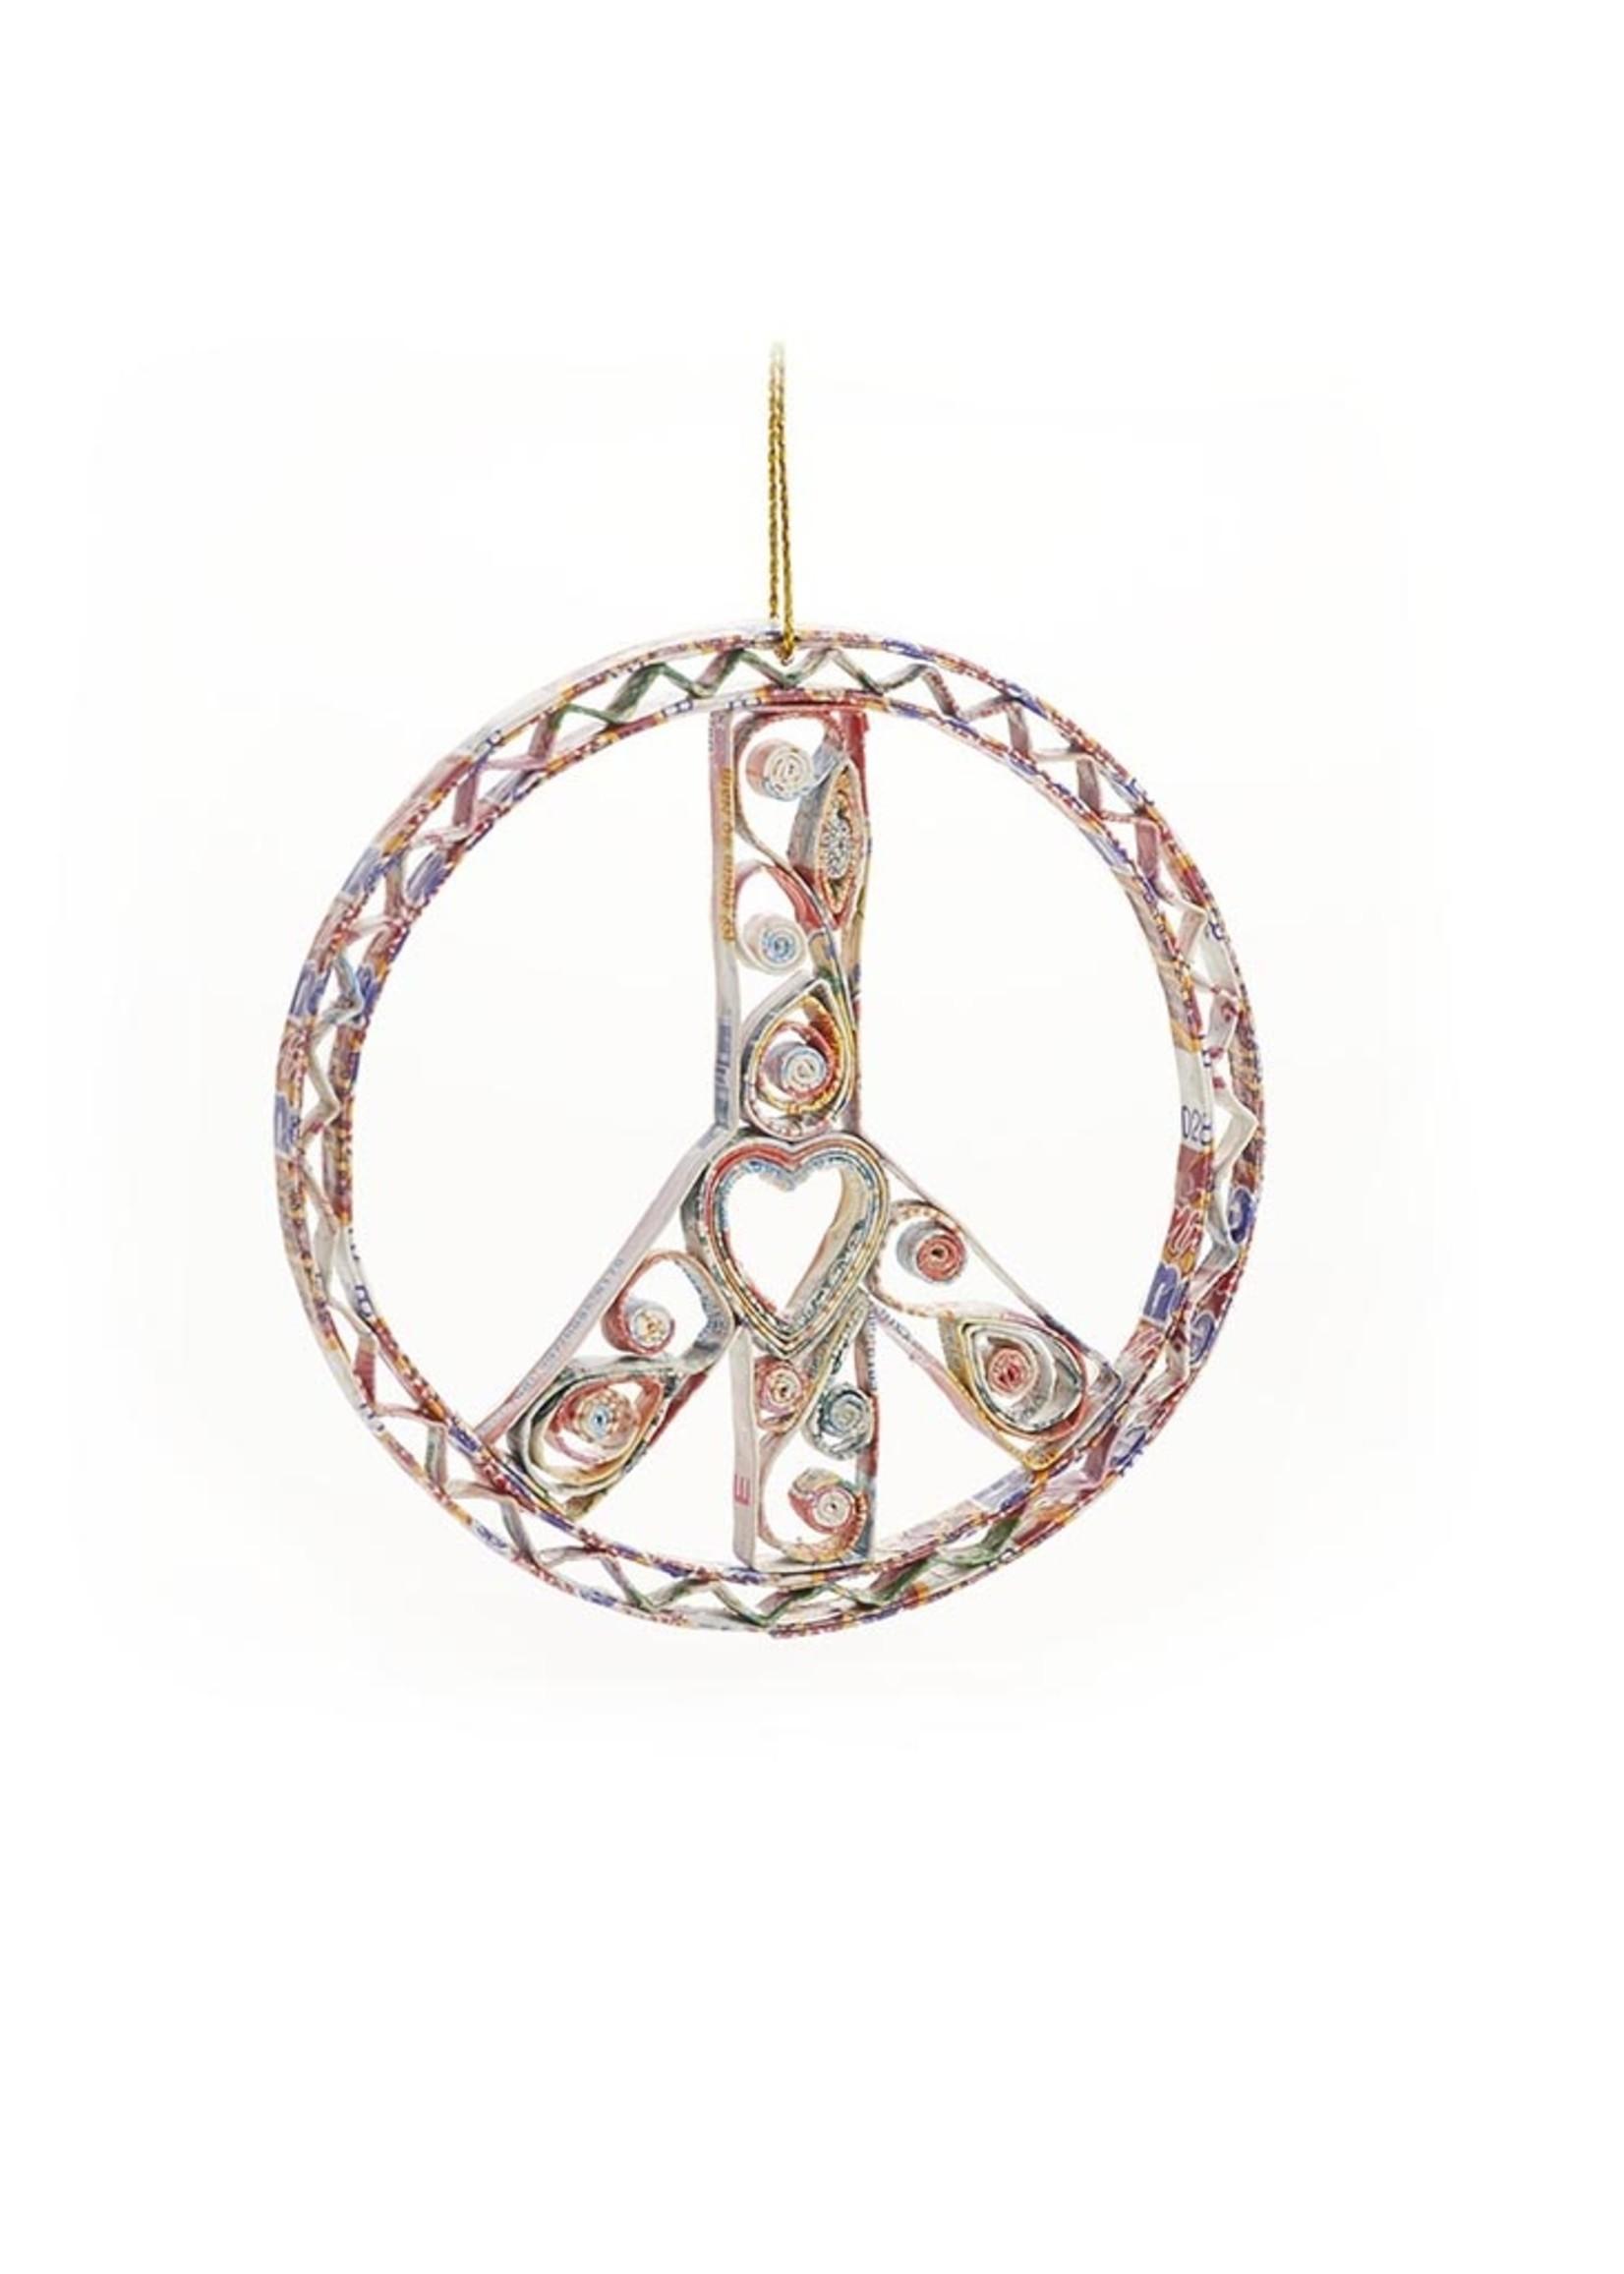 Mai Vietnamese Handicrafts Quilled Peace Sign Ornament